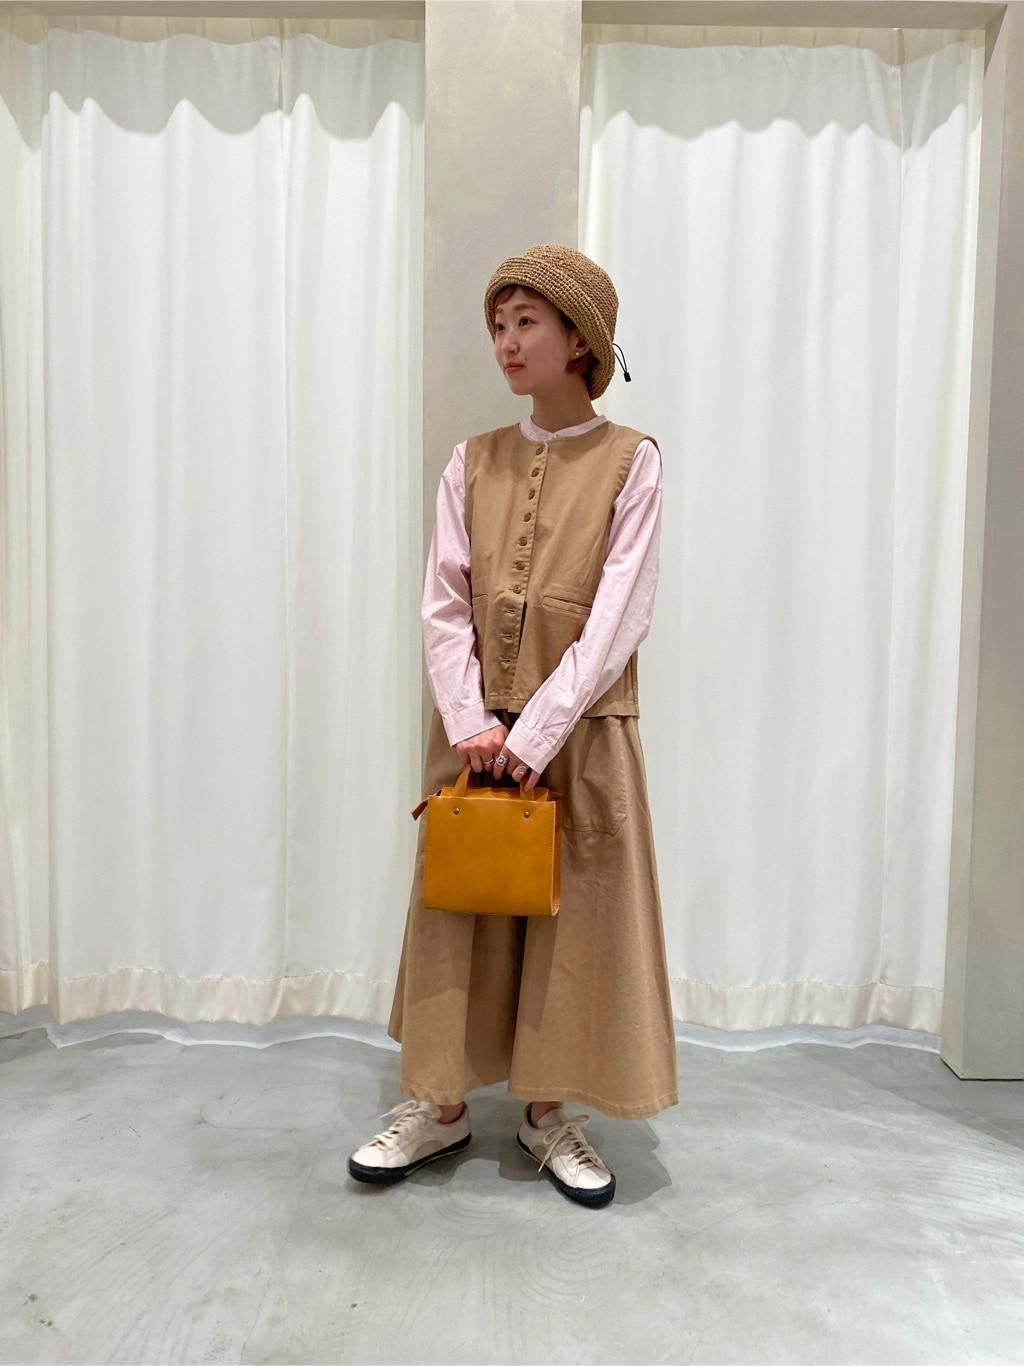 CHILD WOMAN , PAR ICI 東京スカイツリータウン・ソラマチ 2021.05.11